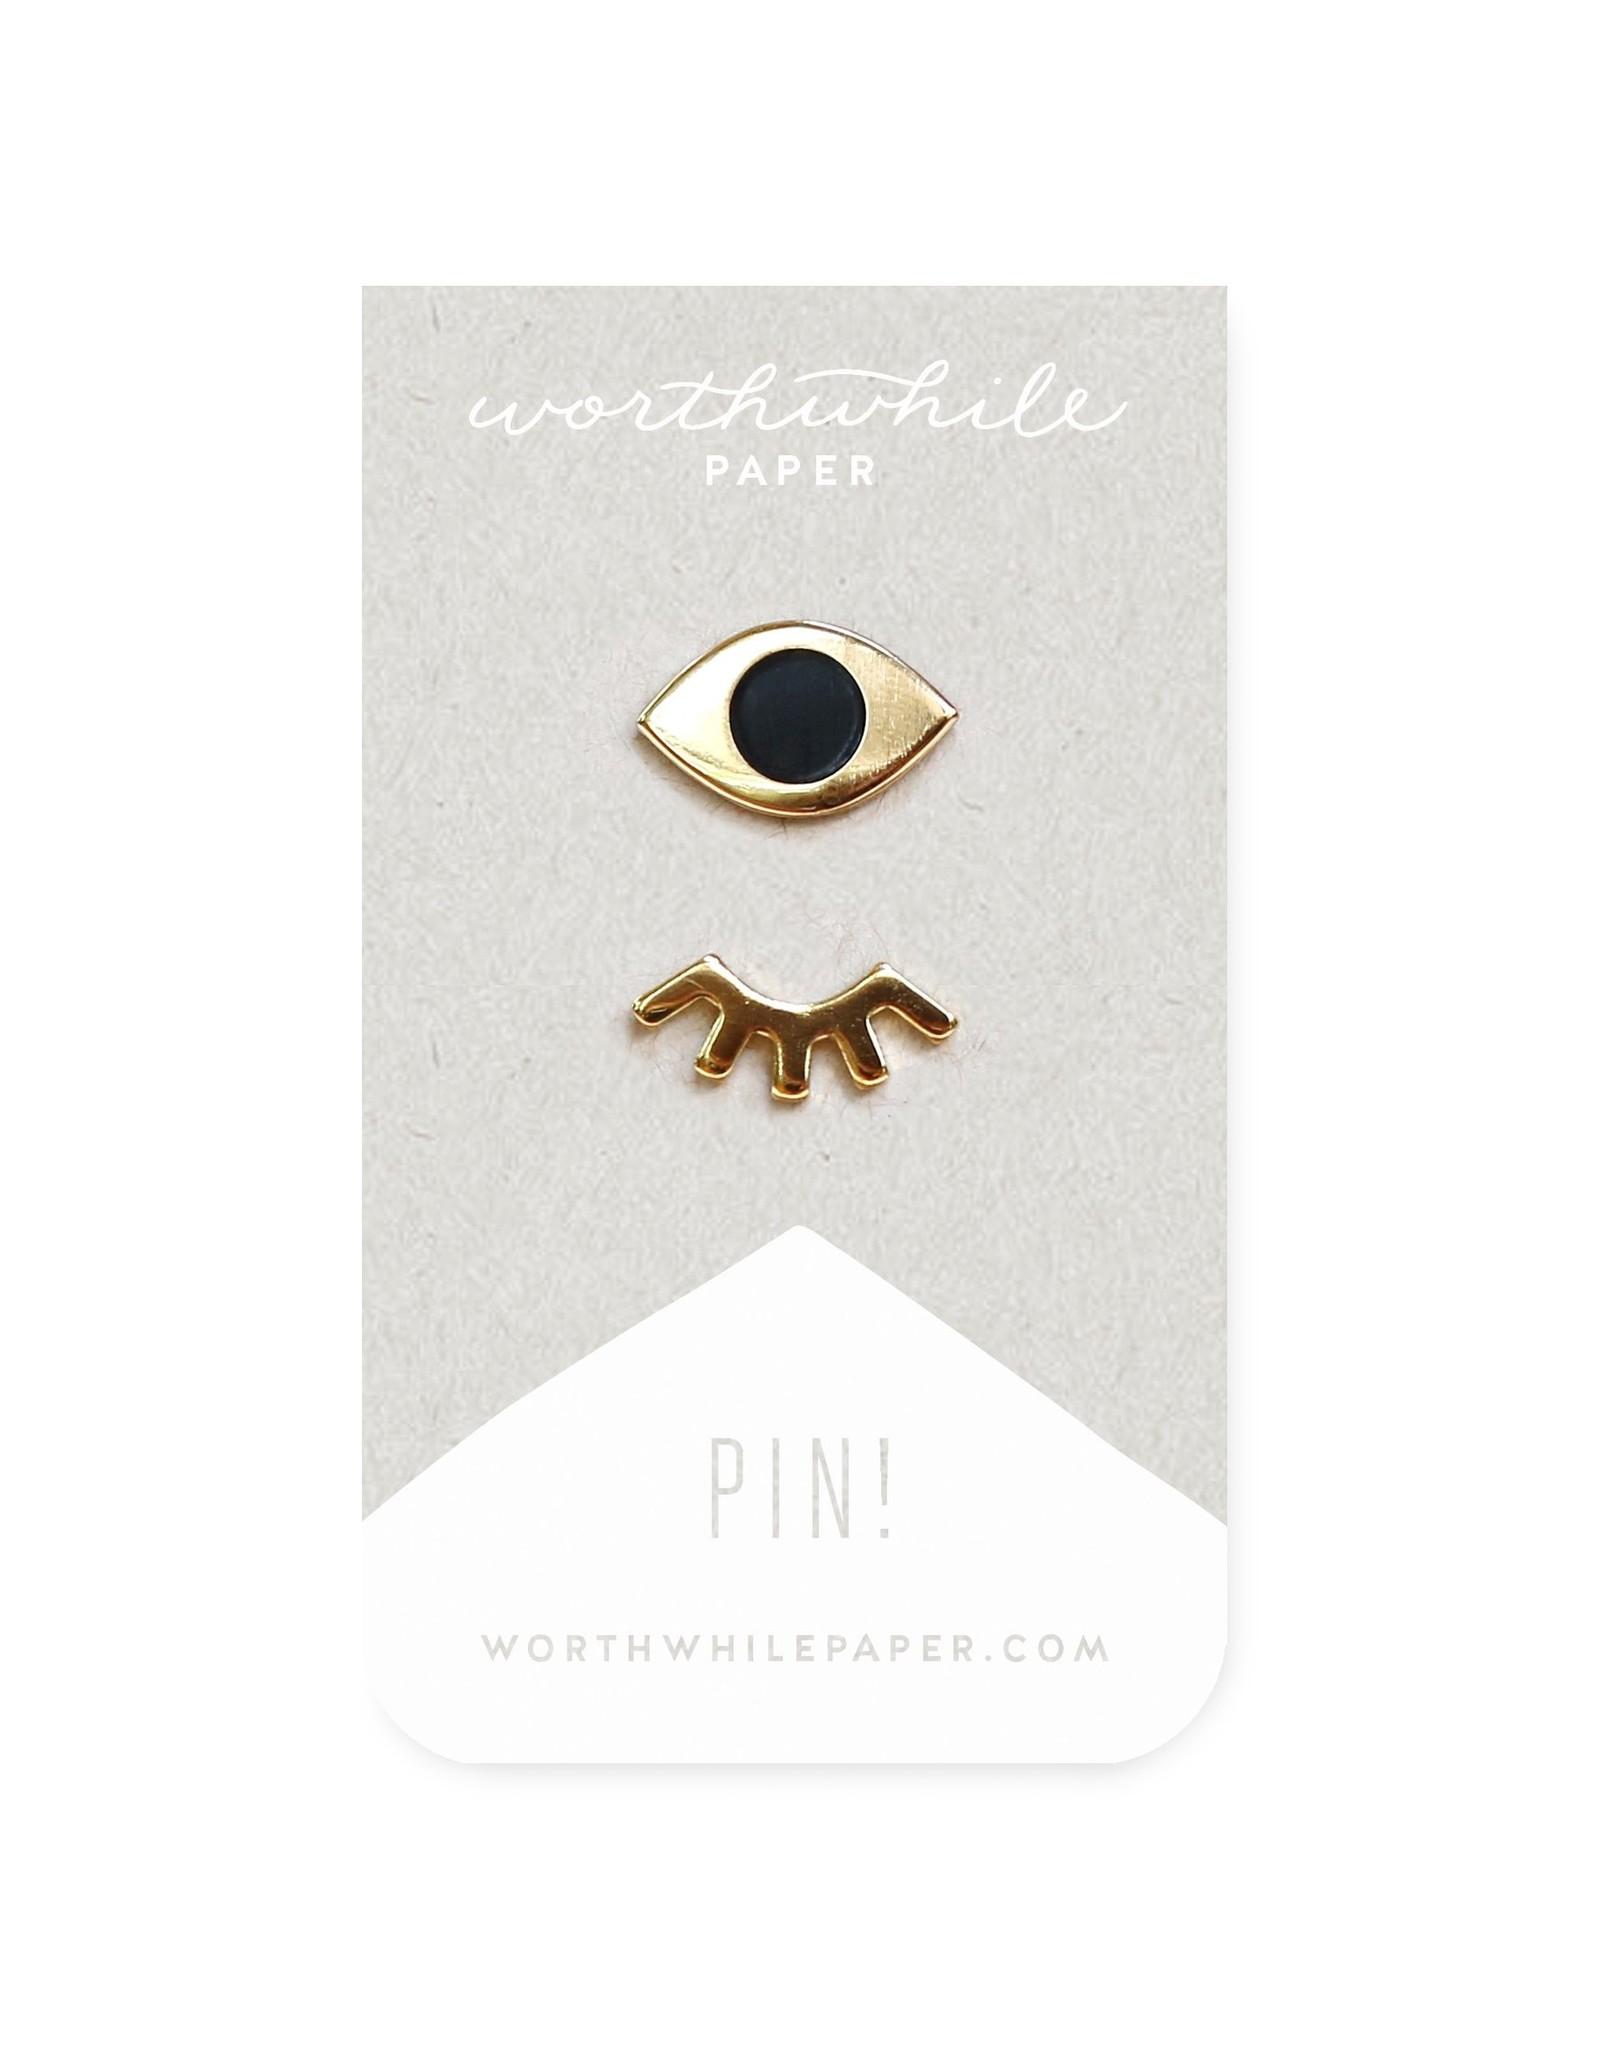 "Enamel Pin 2 pc. Set ""Winky Eyes"" - Worthwhile Paper"